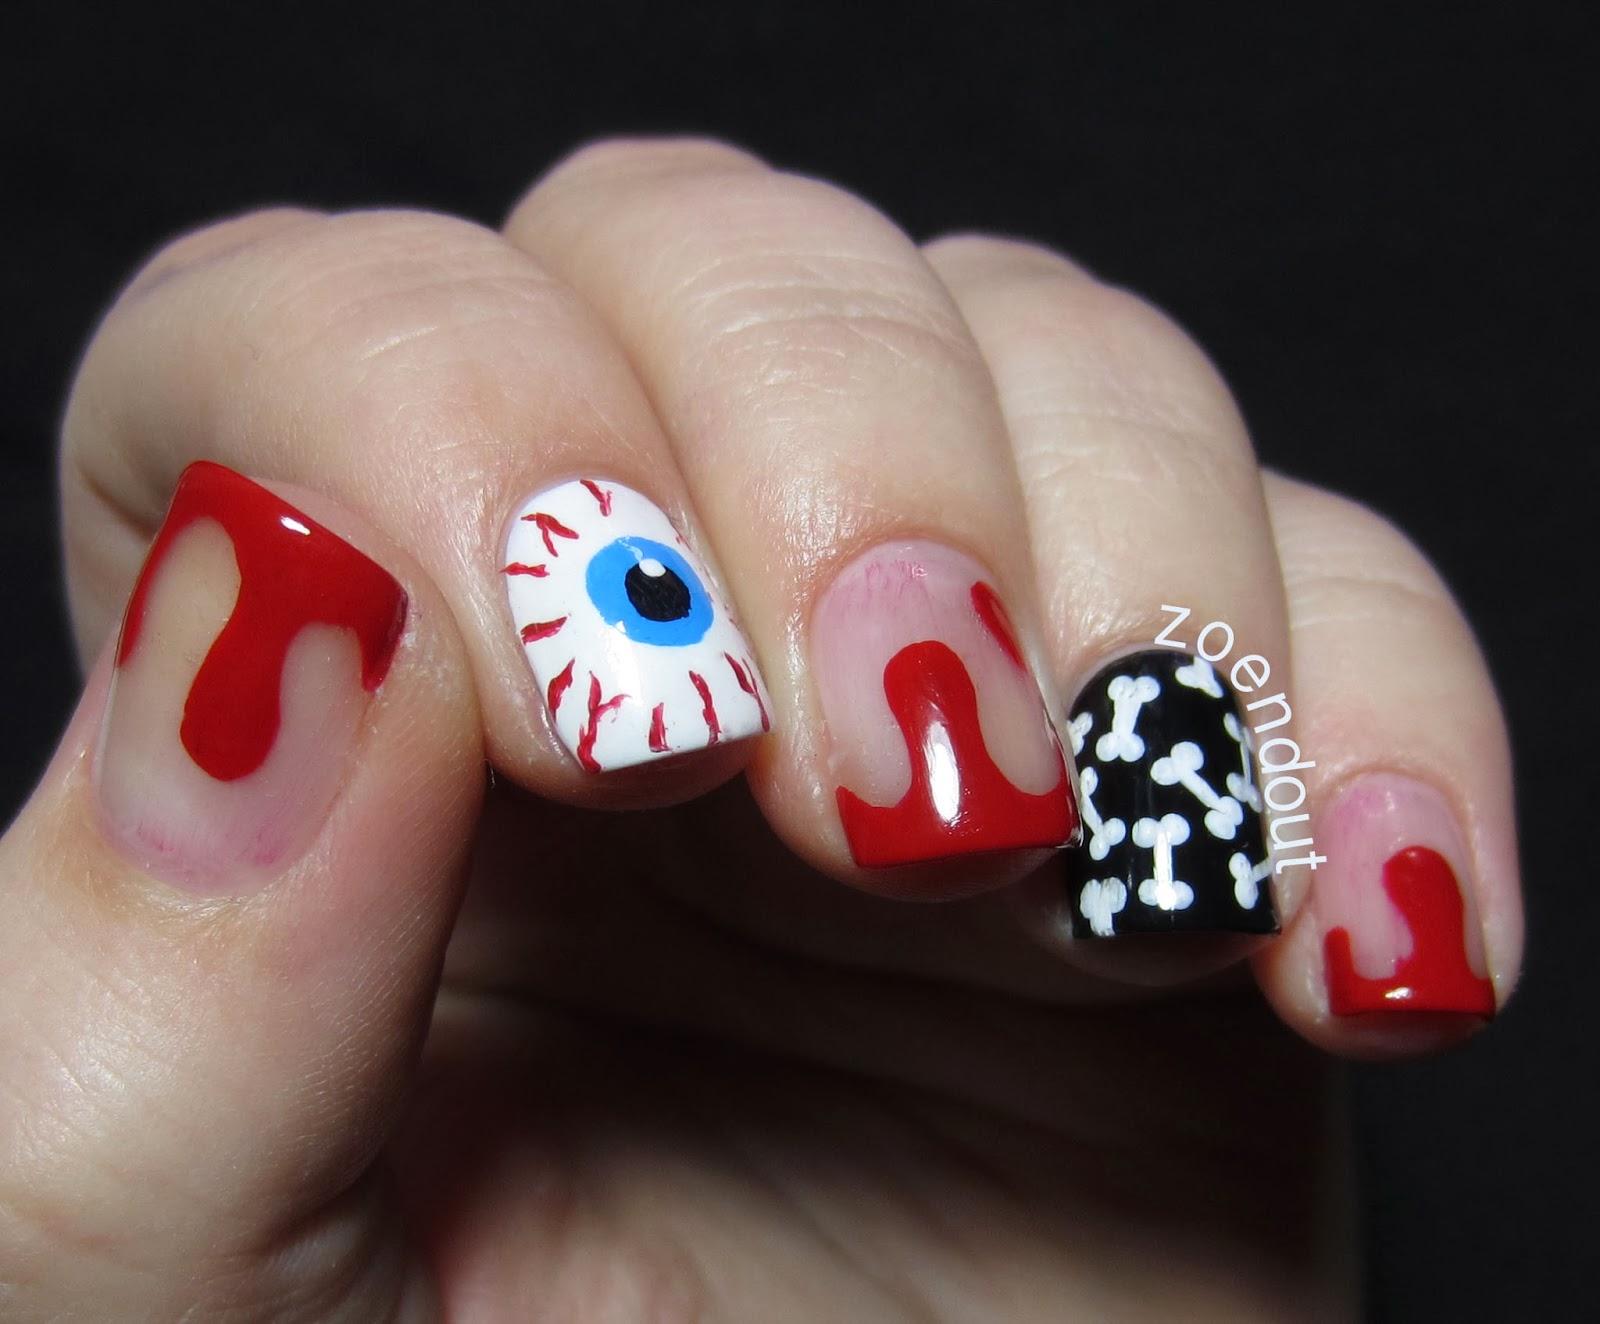 acrylic nails tumblr 2013 joy studio design gallery